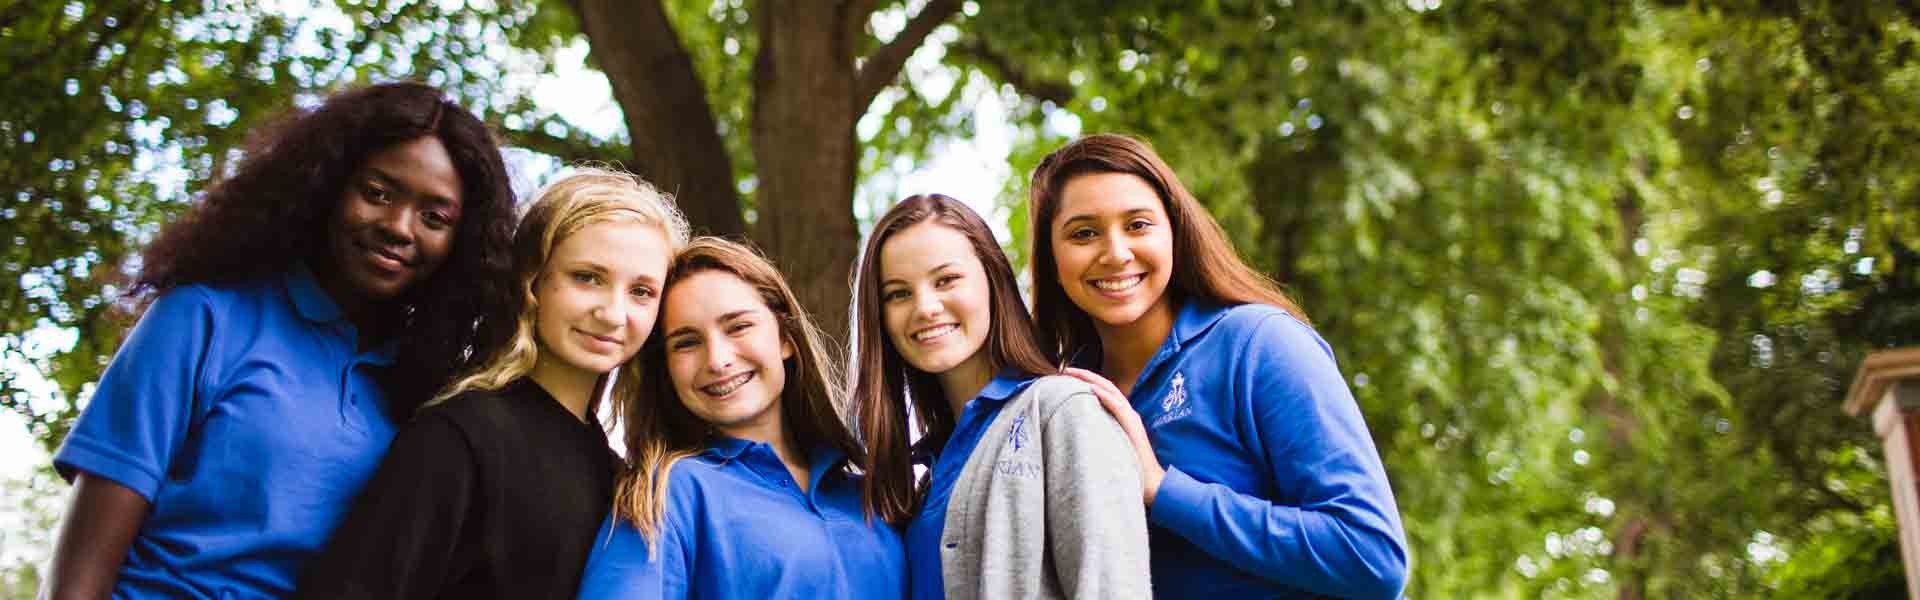 Marian Nebraska USA Girls Banner 2019